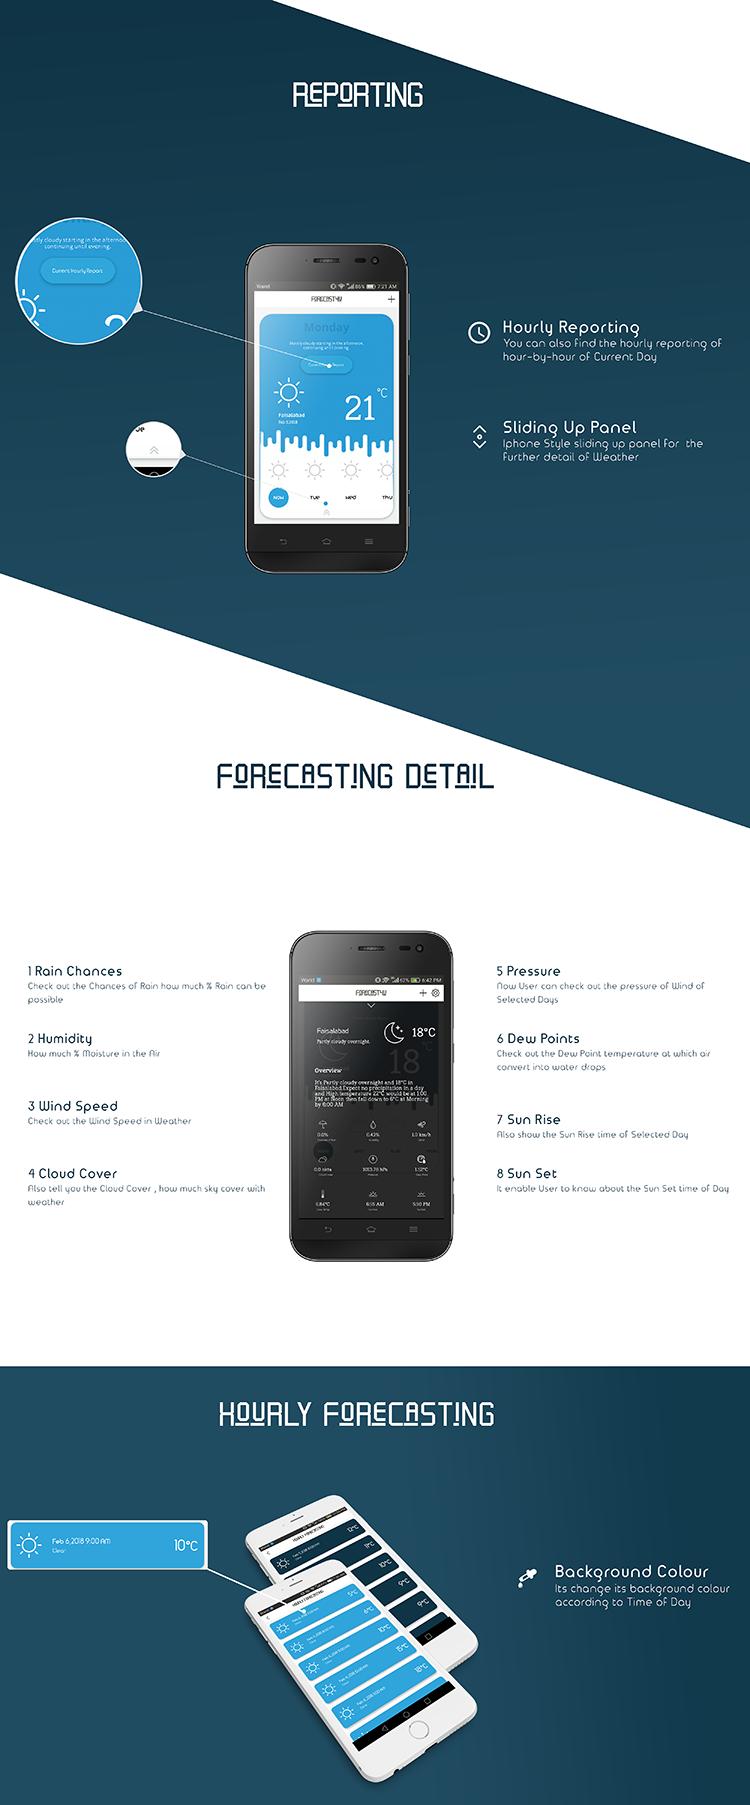 Forecast4u Weather App+Offline Cache - 2 forecast4u weather app+offline cache nulled free download Forecast4u Weather App+Offline Cache Nulled Free Download showcase two